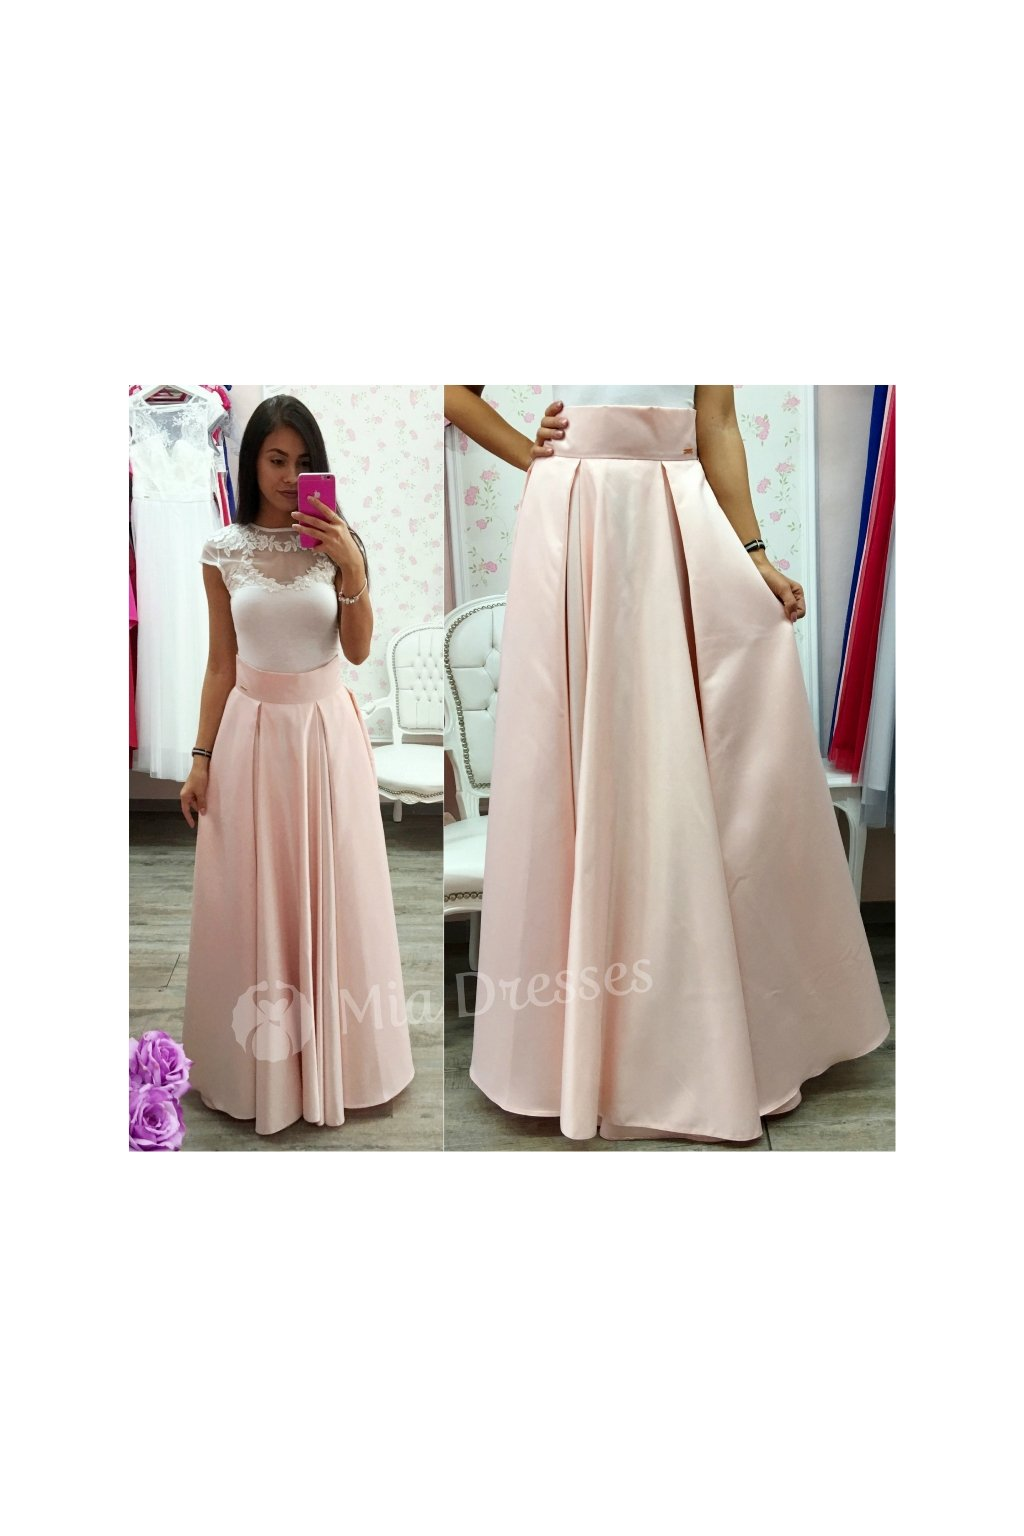 7dd8bc0a7e13 Biela dlhá sukňa - Mia Dresses